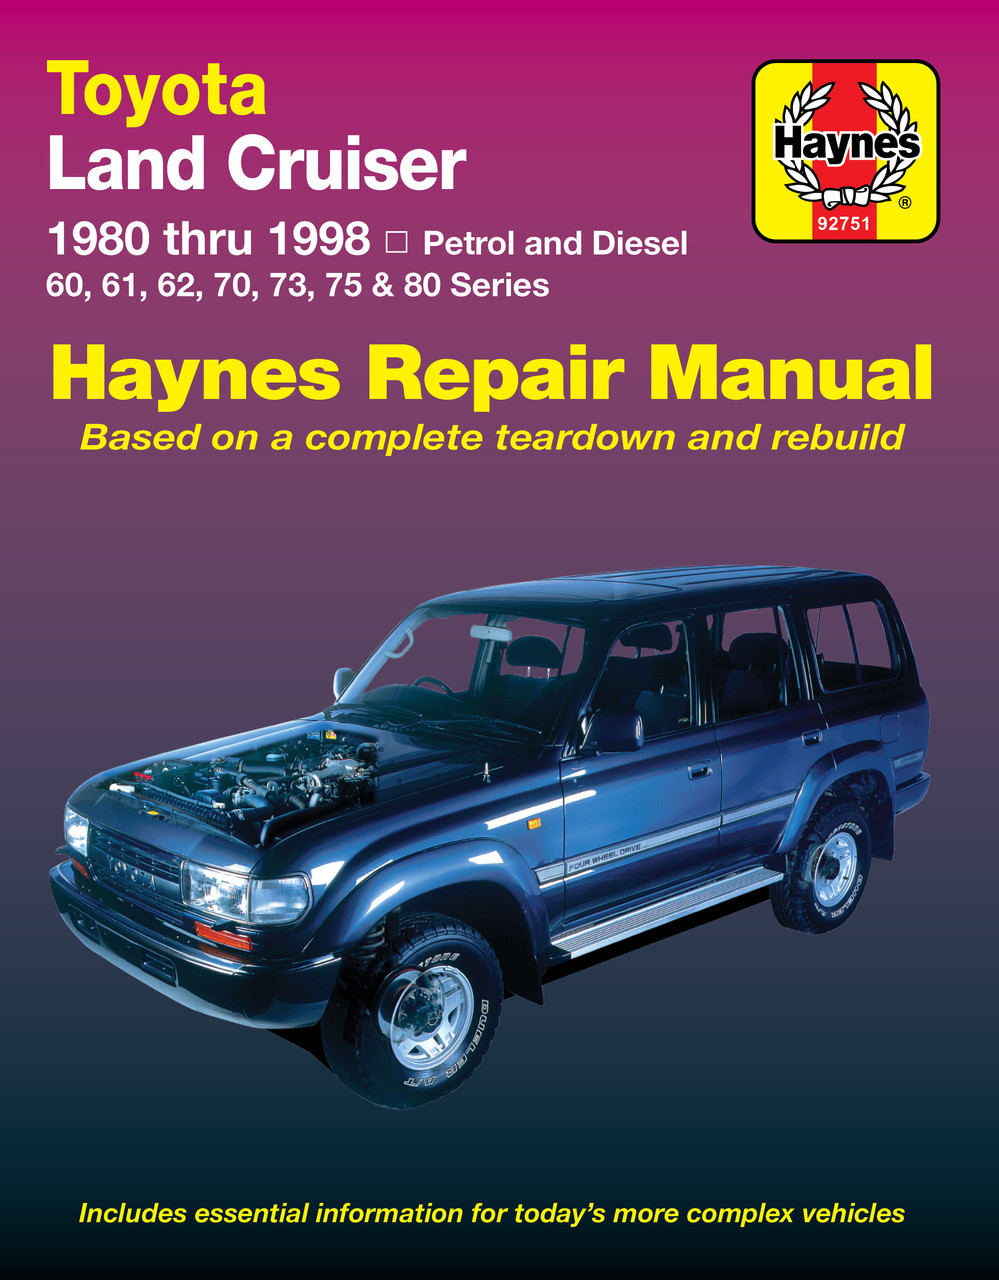 1993 toyota land cruiser belt diagram explained wiring diagrams rh dmdelectro co 1995 toyota land cruiser [ 999 x 1280 Pixel ]